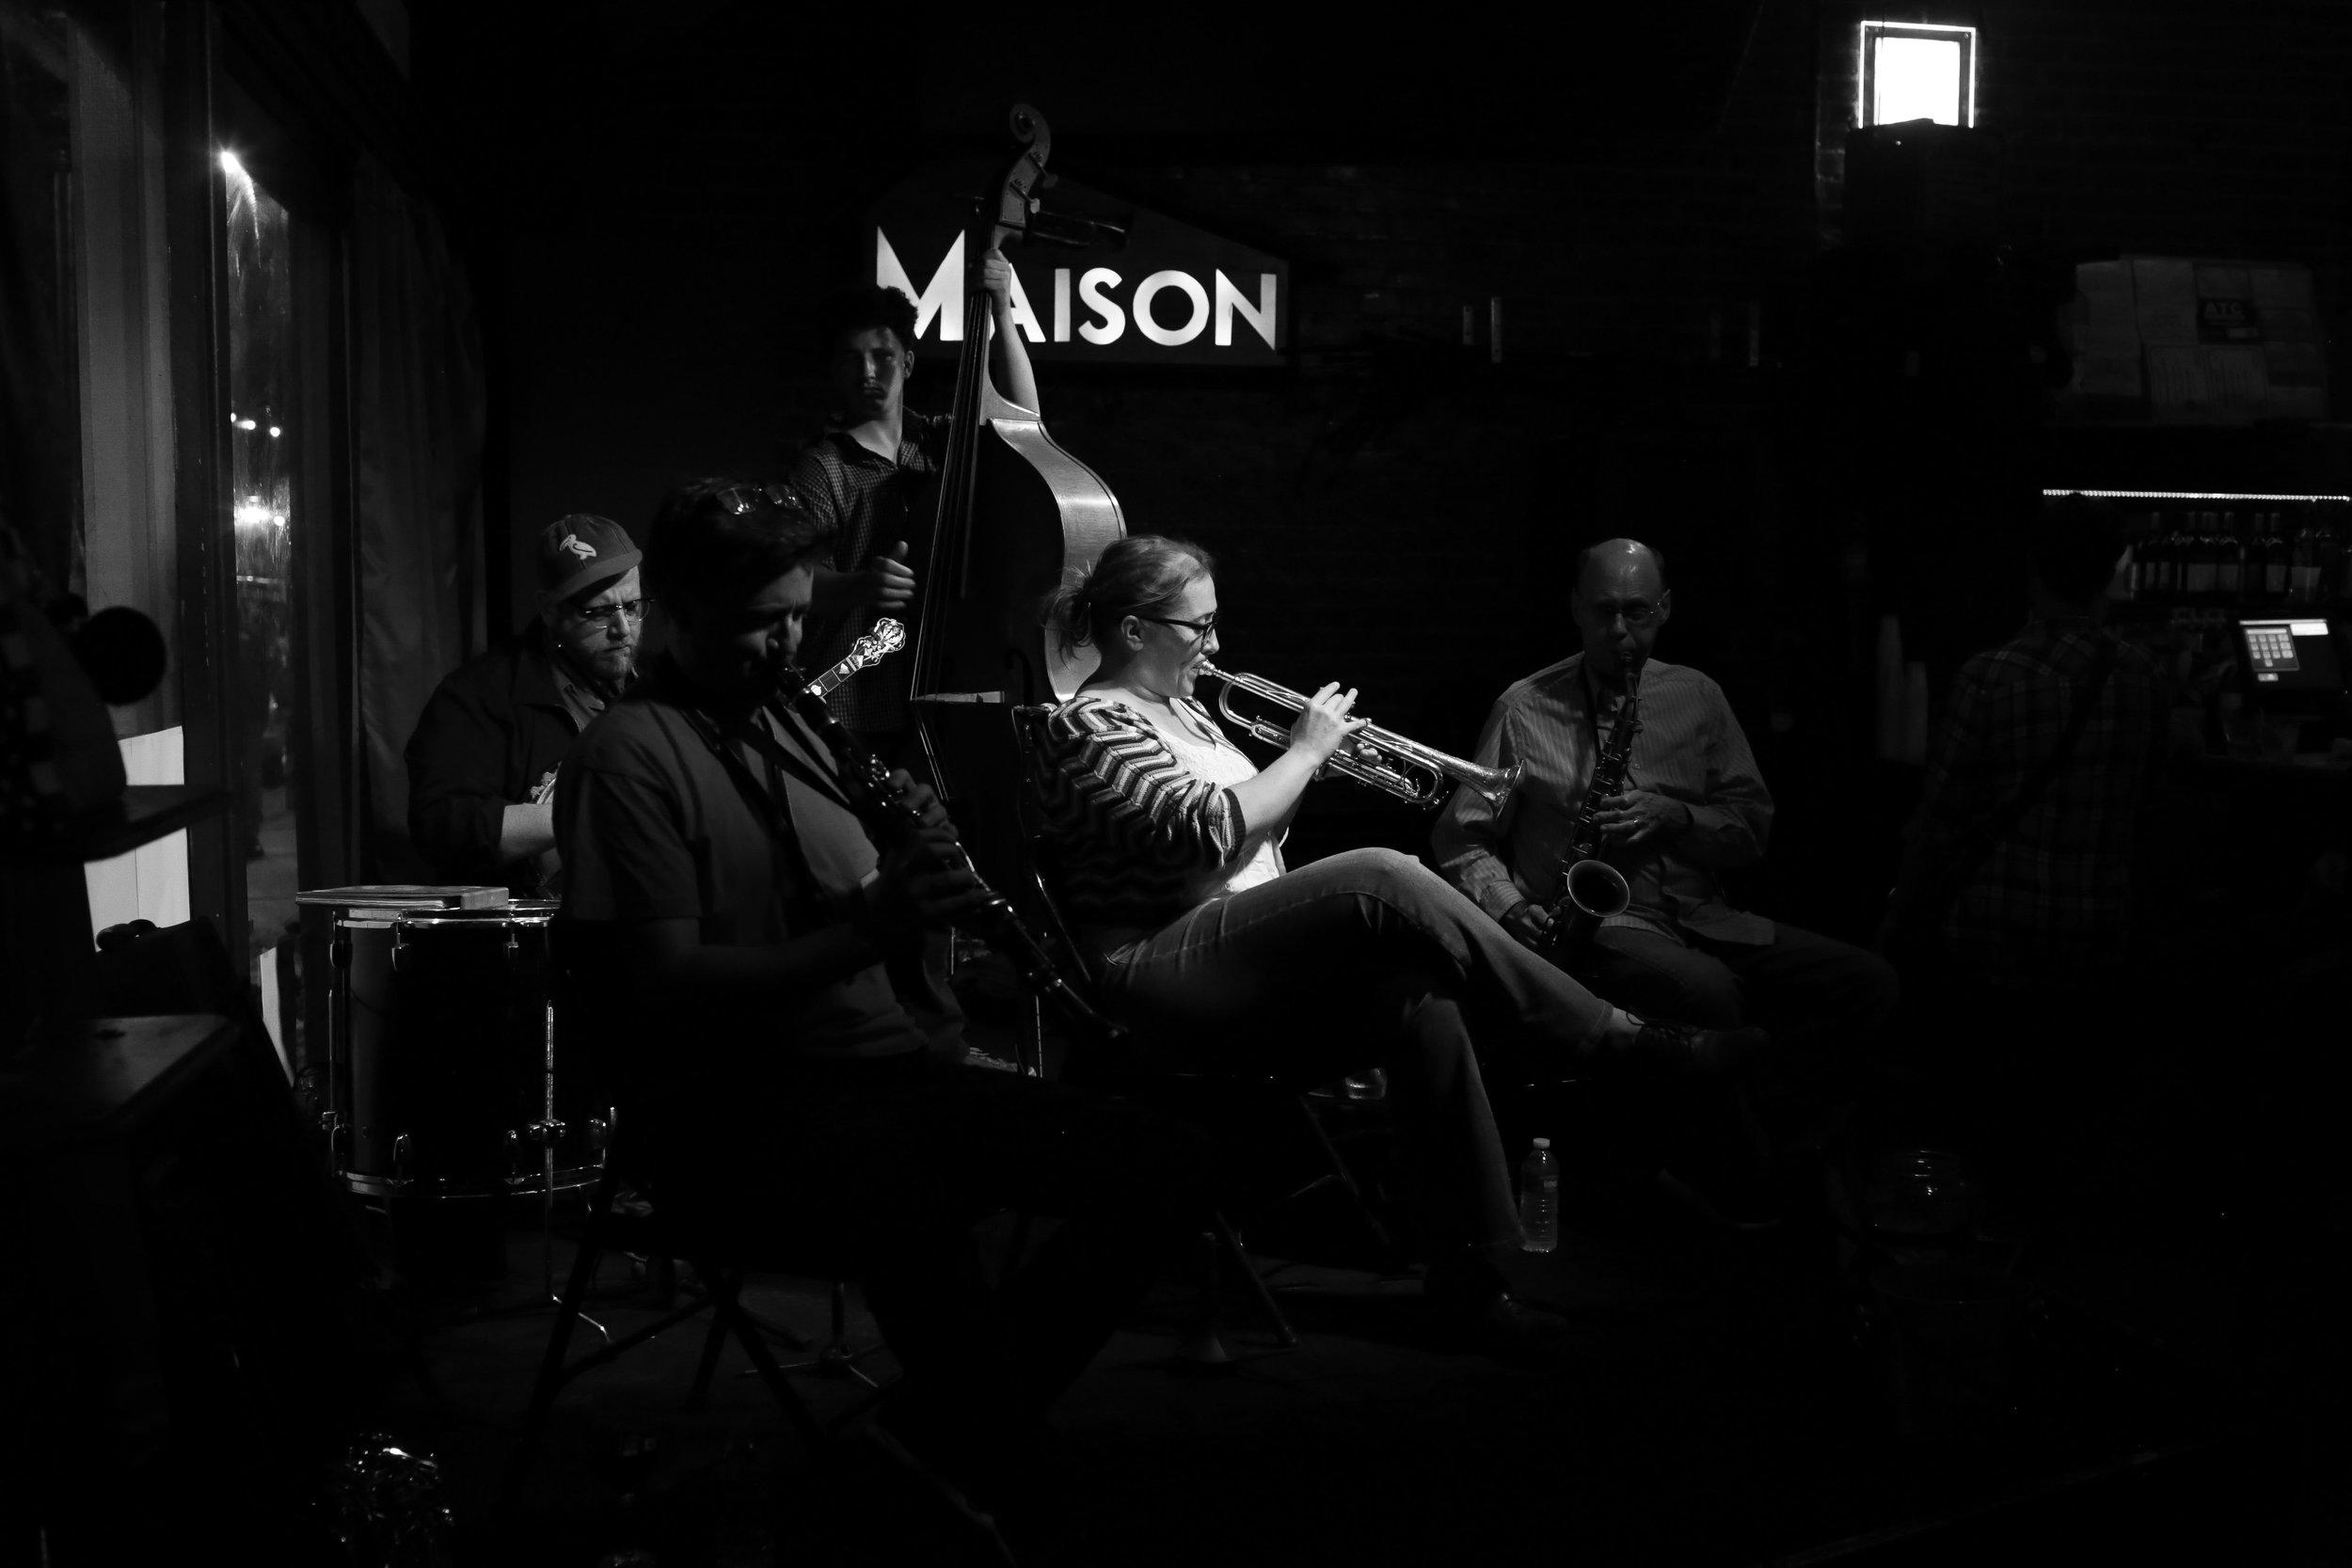 The Shotgun Jazz Band  at  The Maison